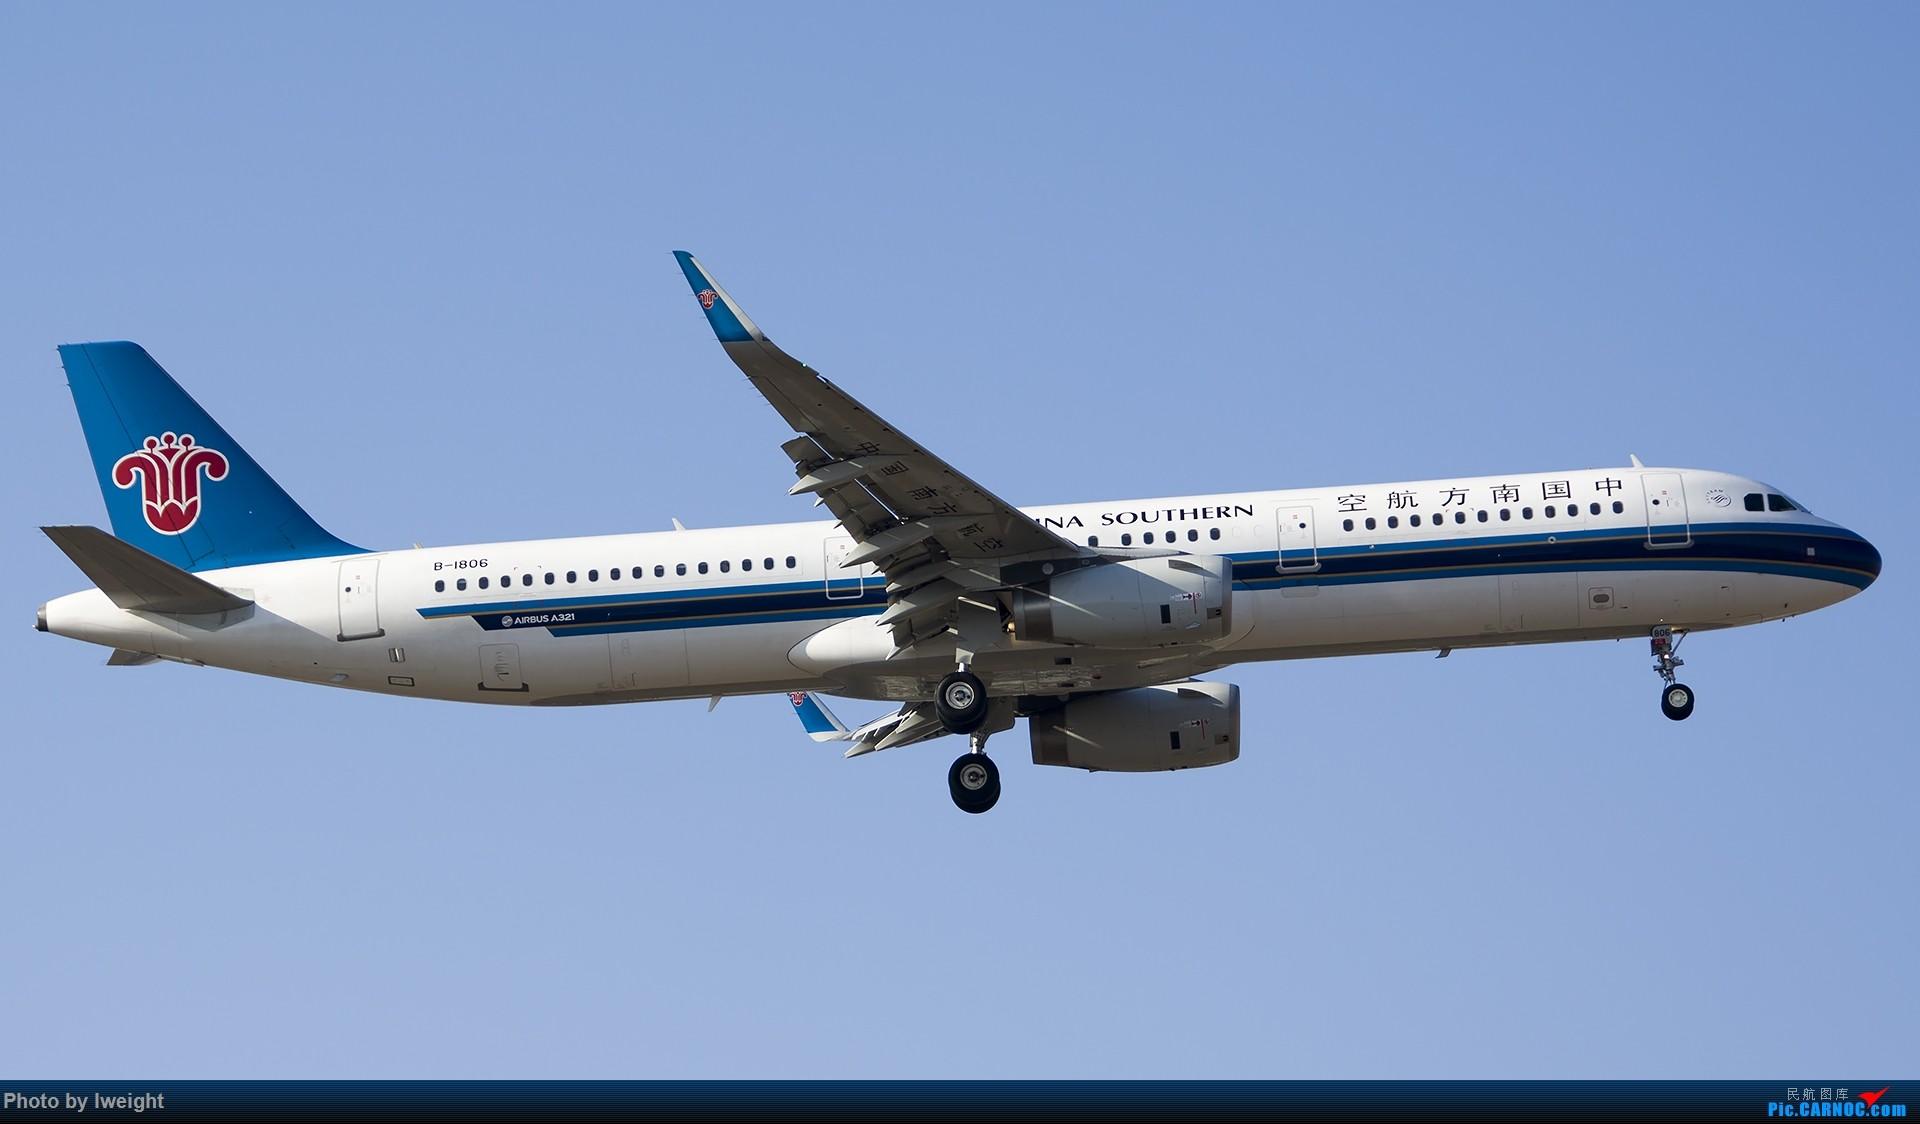 Re:[原创]庆祝升级777,发上今天在首都机场拍的所有飞机【2014-12-14】 AIRBUS A321-200 B-1806 中国北京首都国际机场